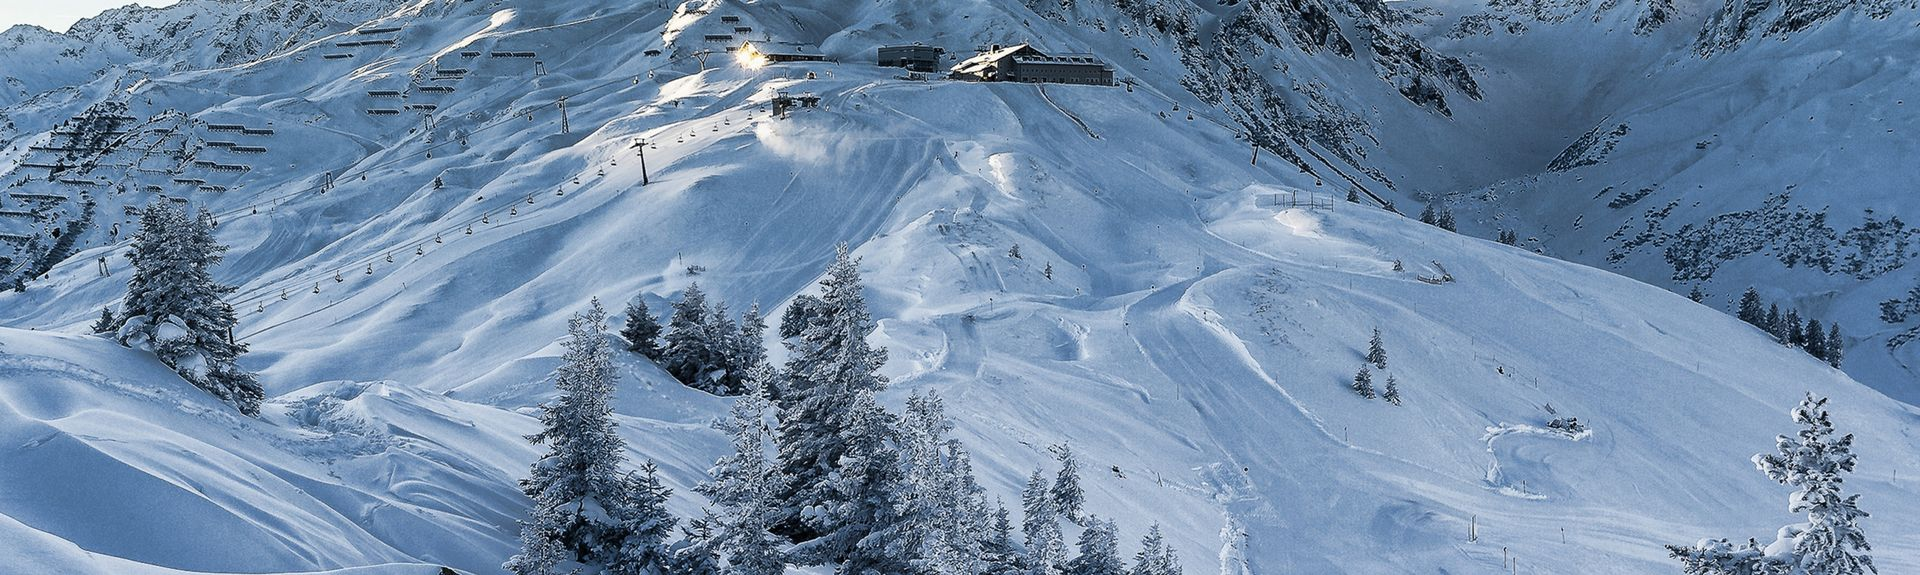 Paznaun, Tyrol, Austria